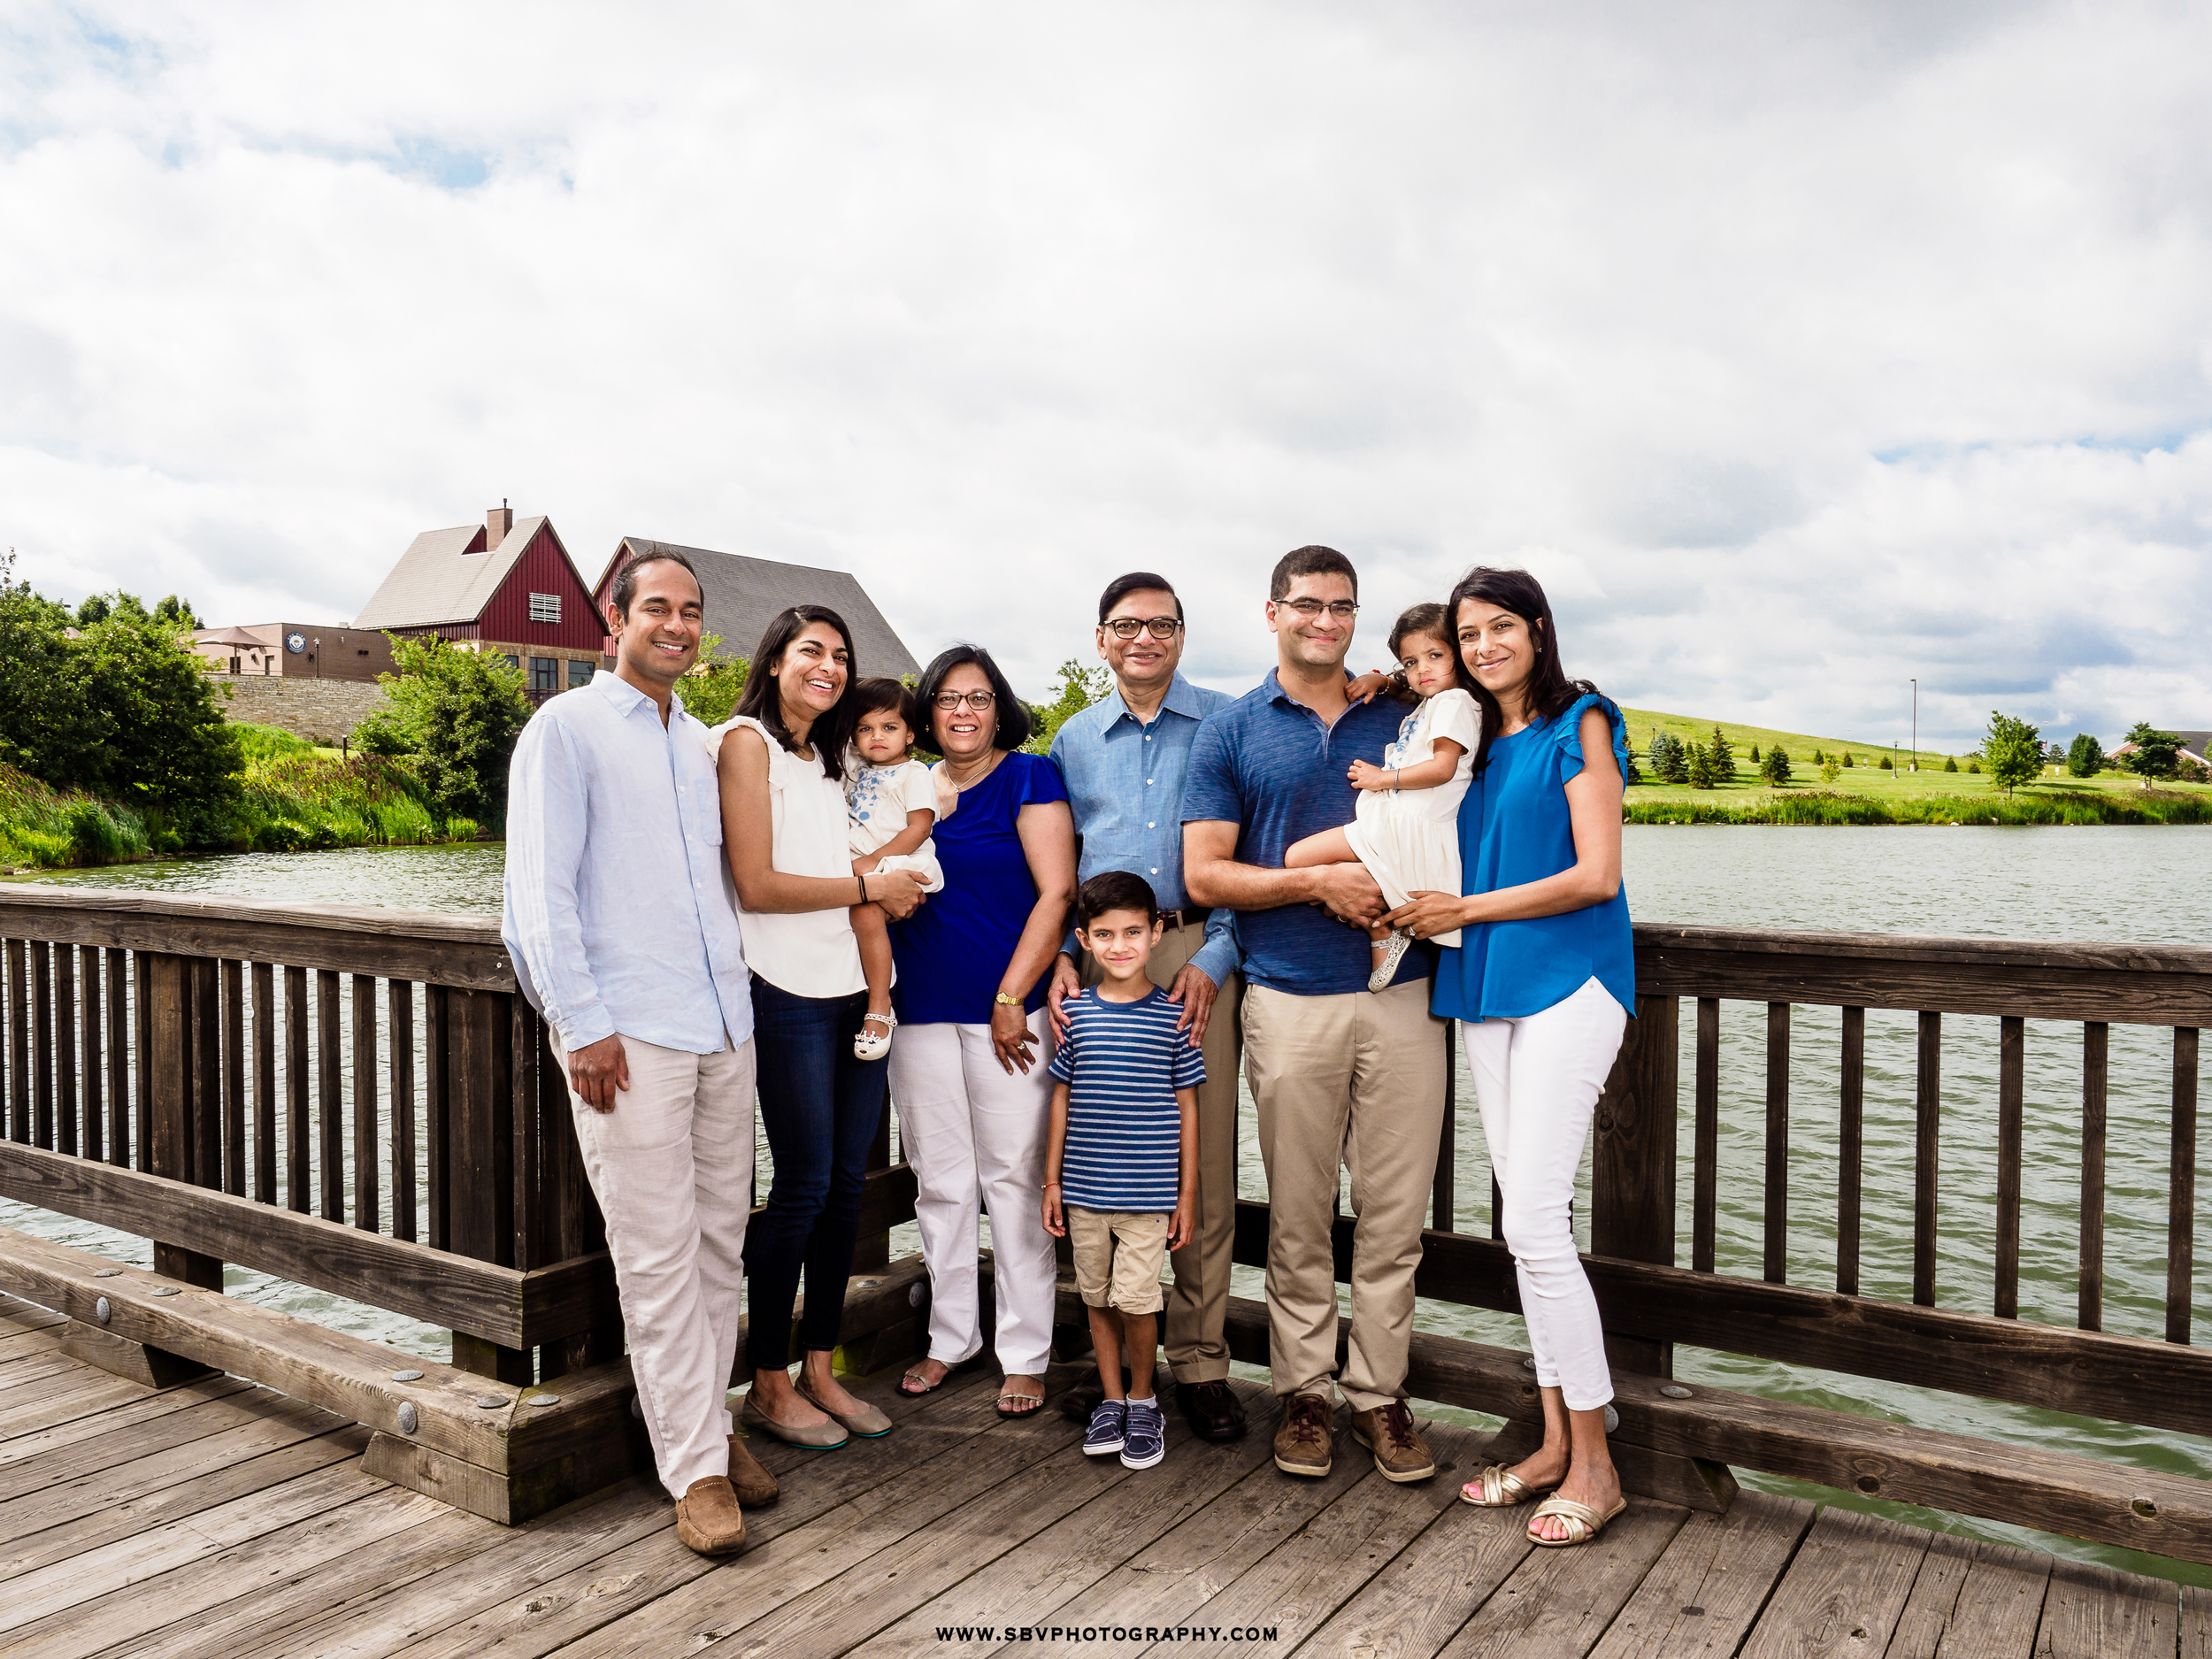 Family photo on the bridge at Centennial Park.